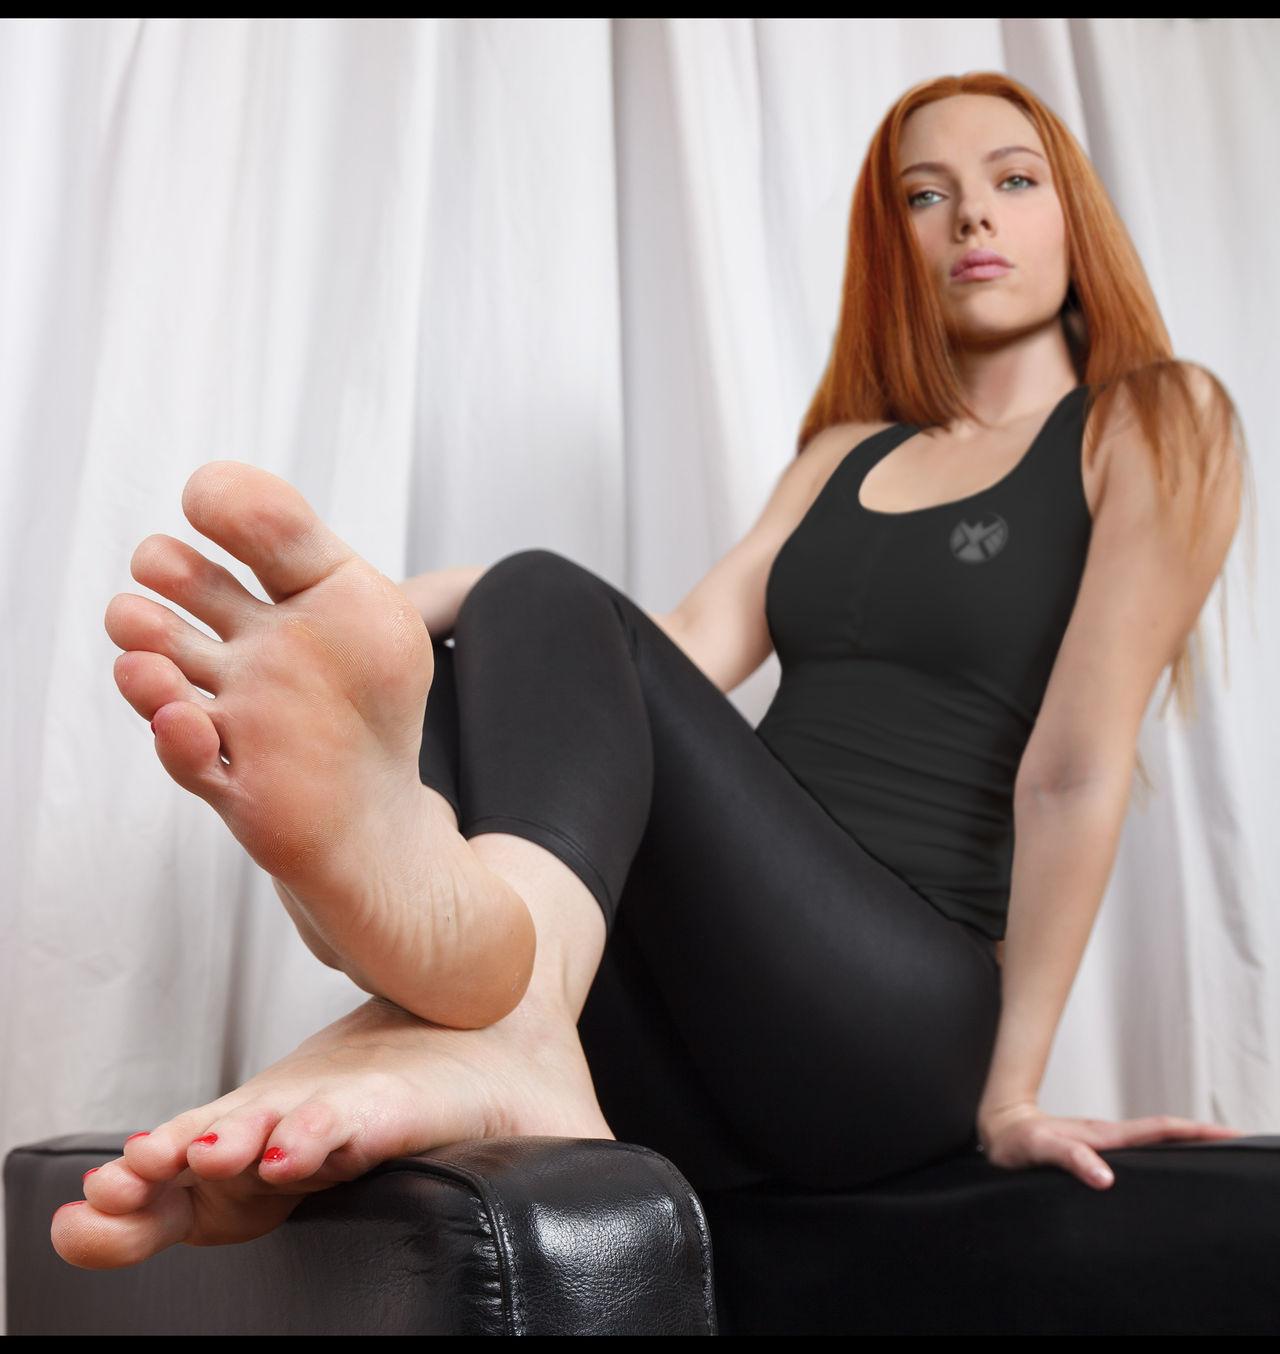 scarlett johansson toes